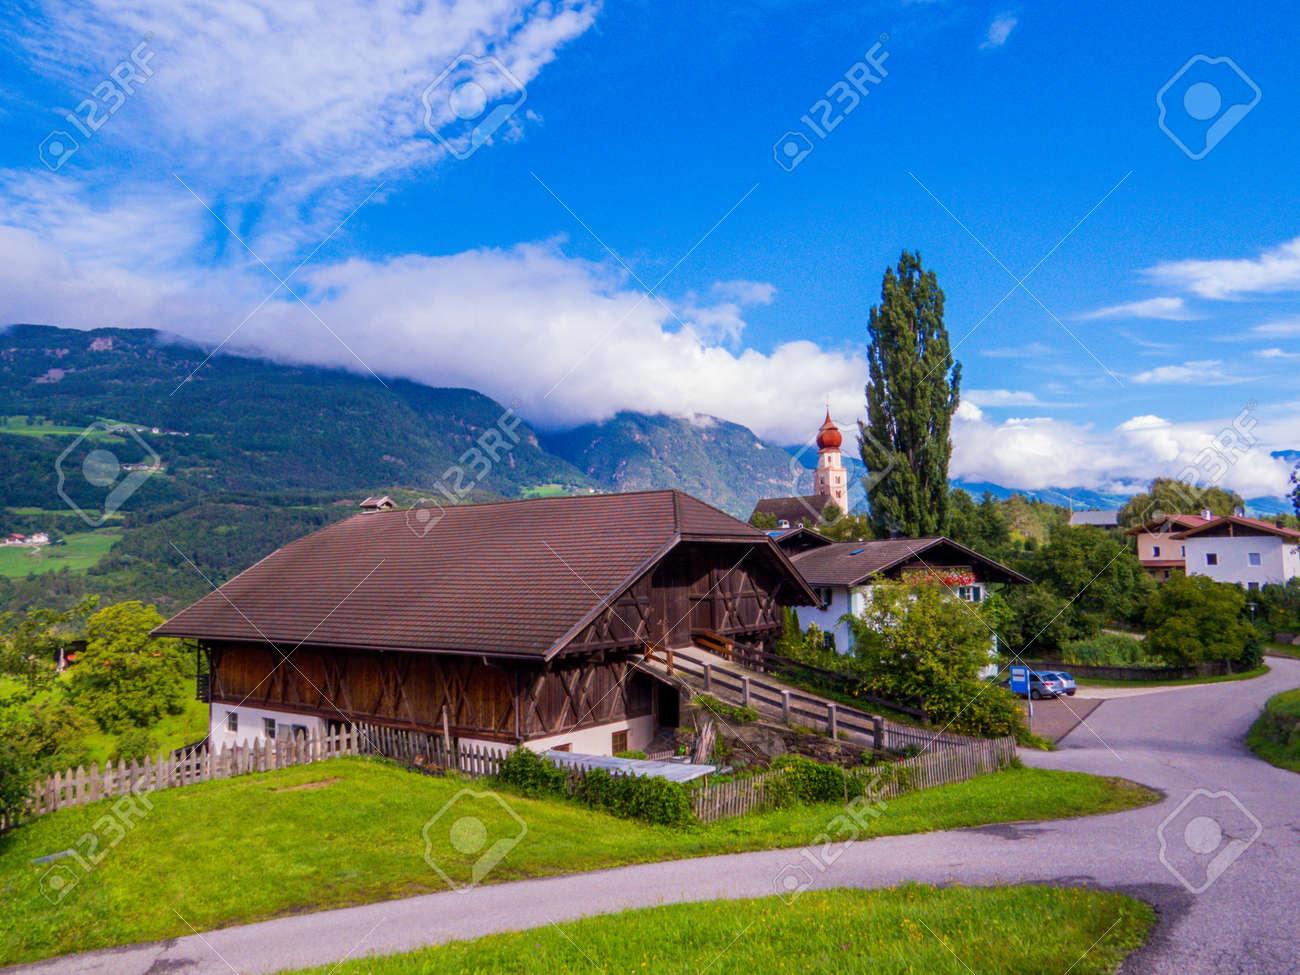 Sant'Osvaldo (St. Oswald), Castelrotto (Kastelruth), Dolomites, north Italy - 151623306